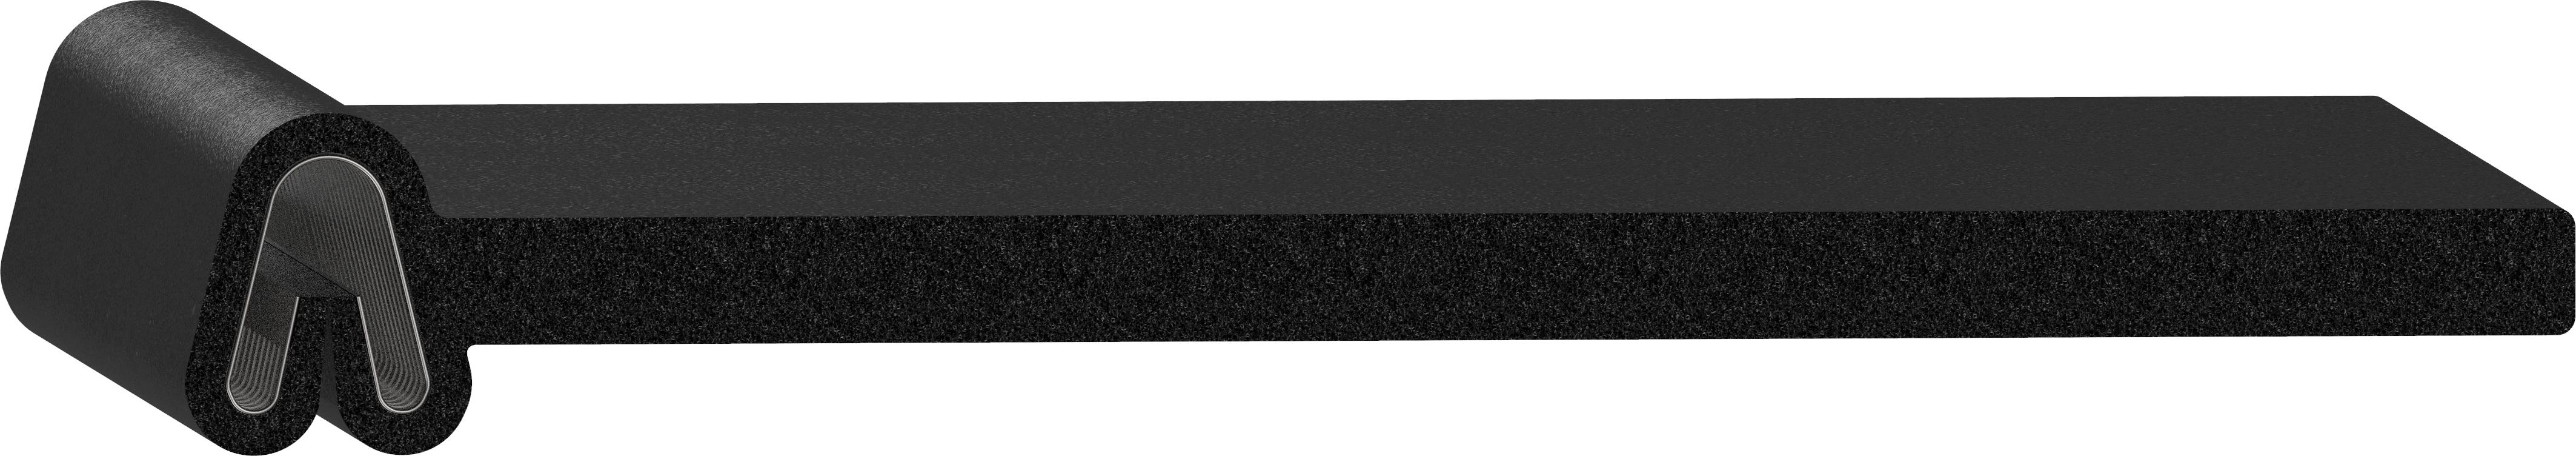 Uni-Grip part: ED-5345